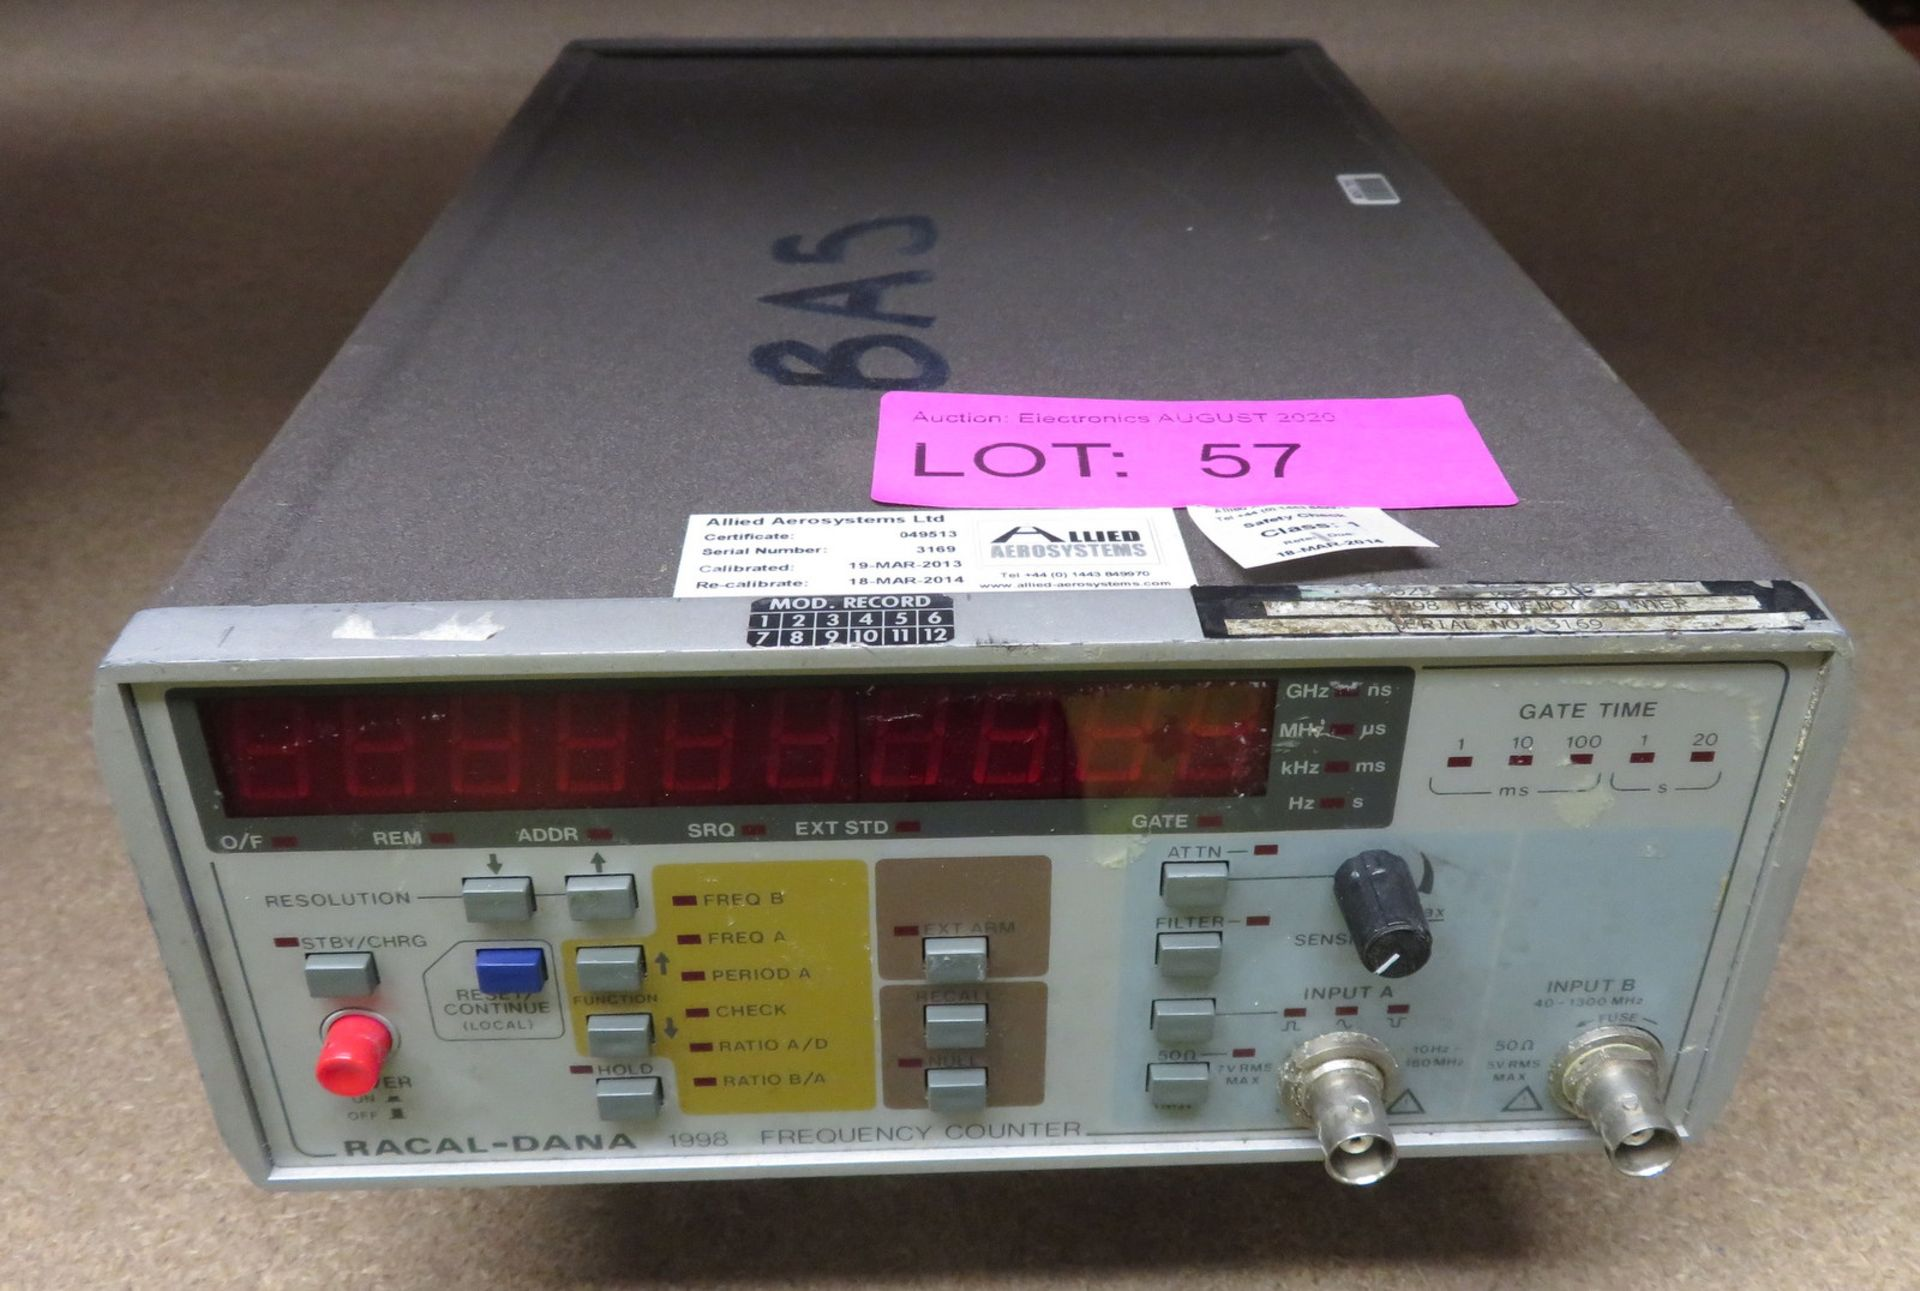 Lot 57 - Racal Dana 1998 frequency counter